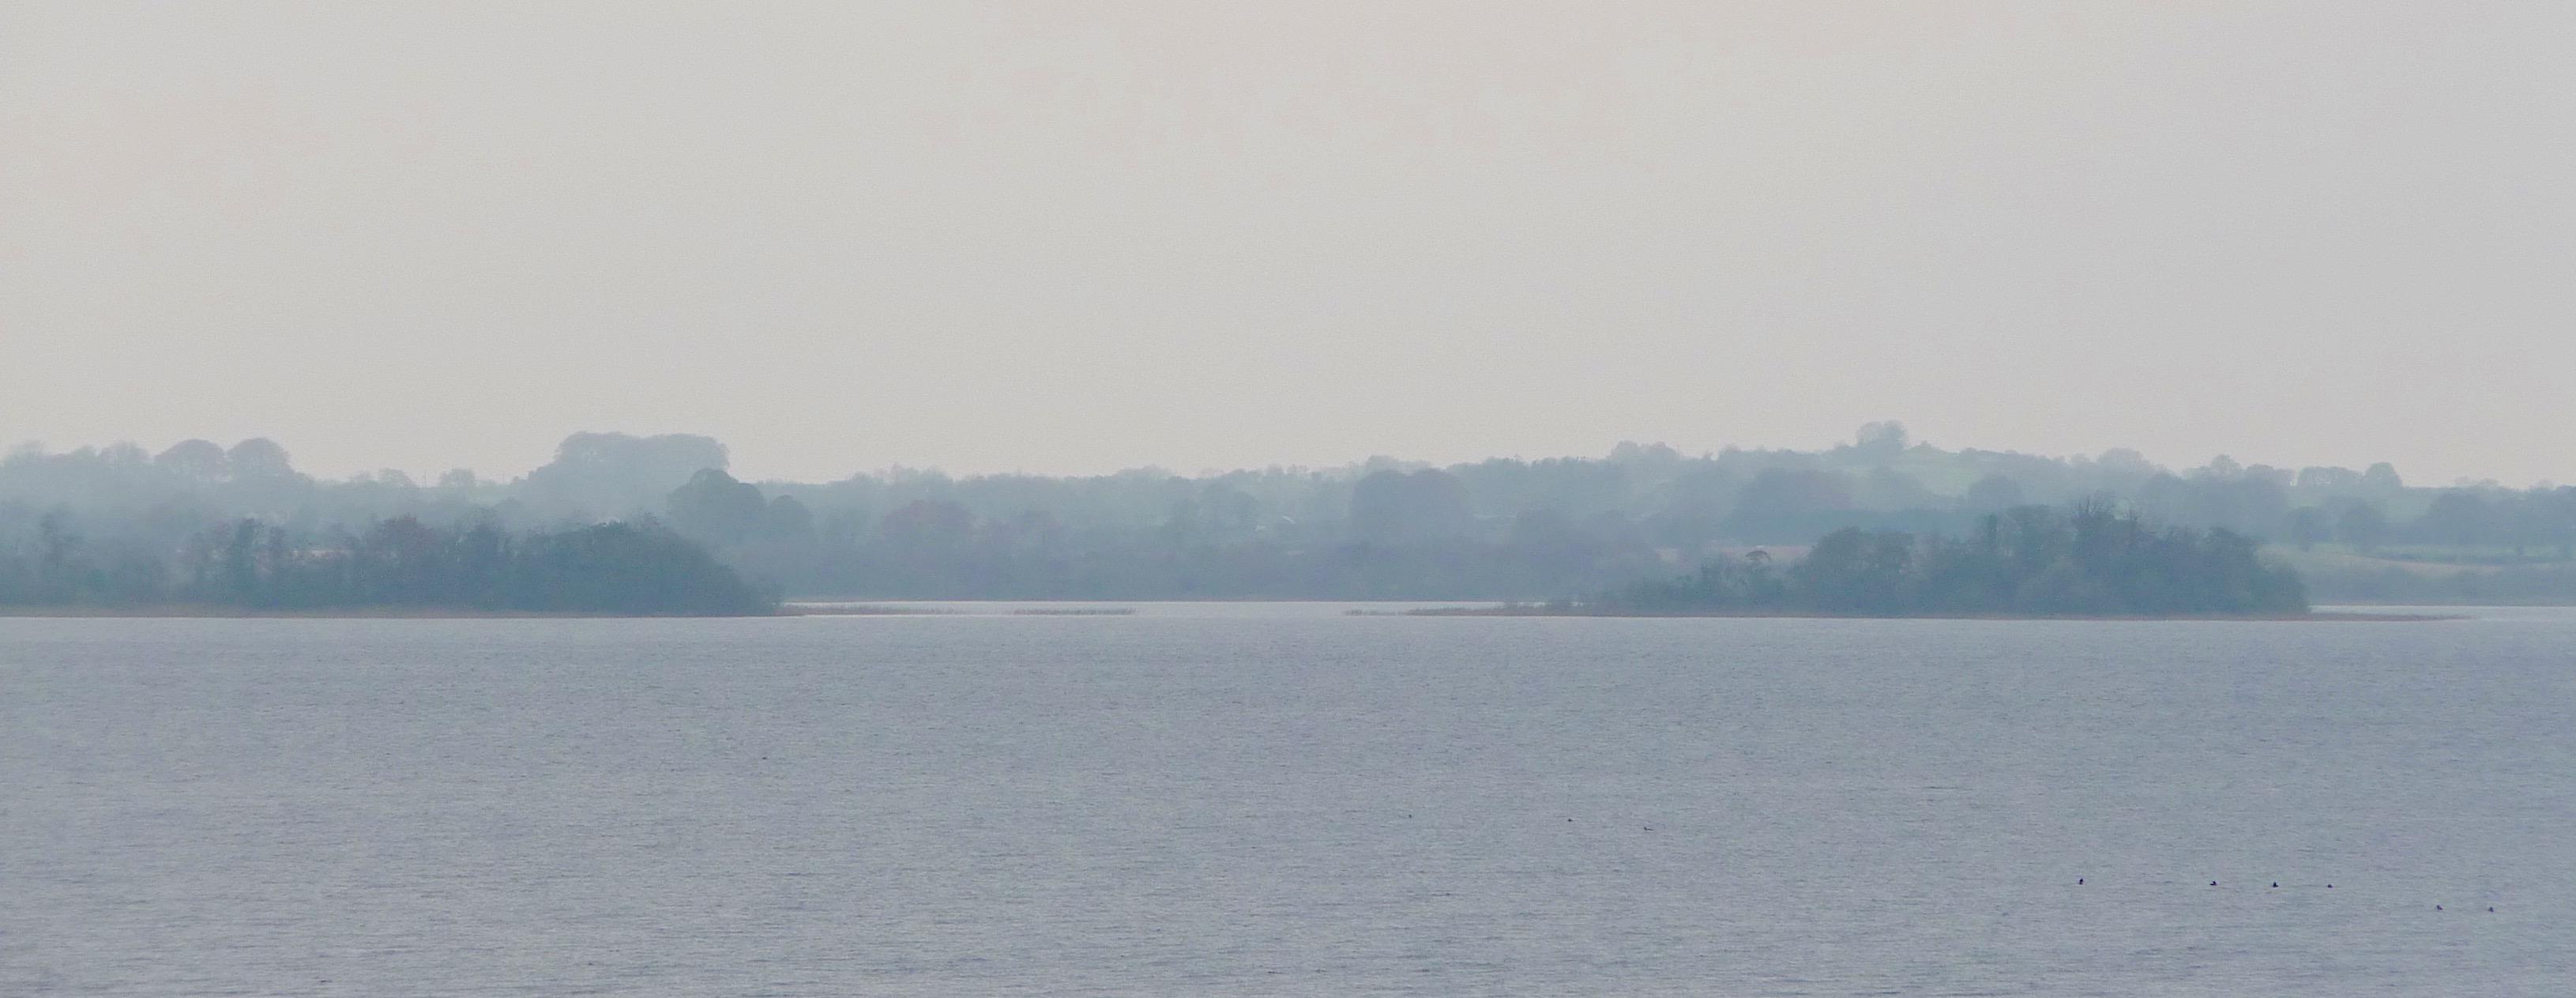 10.Lough Ree islands